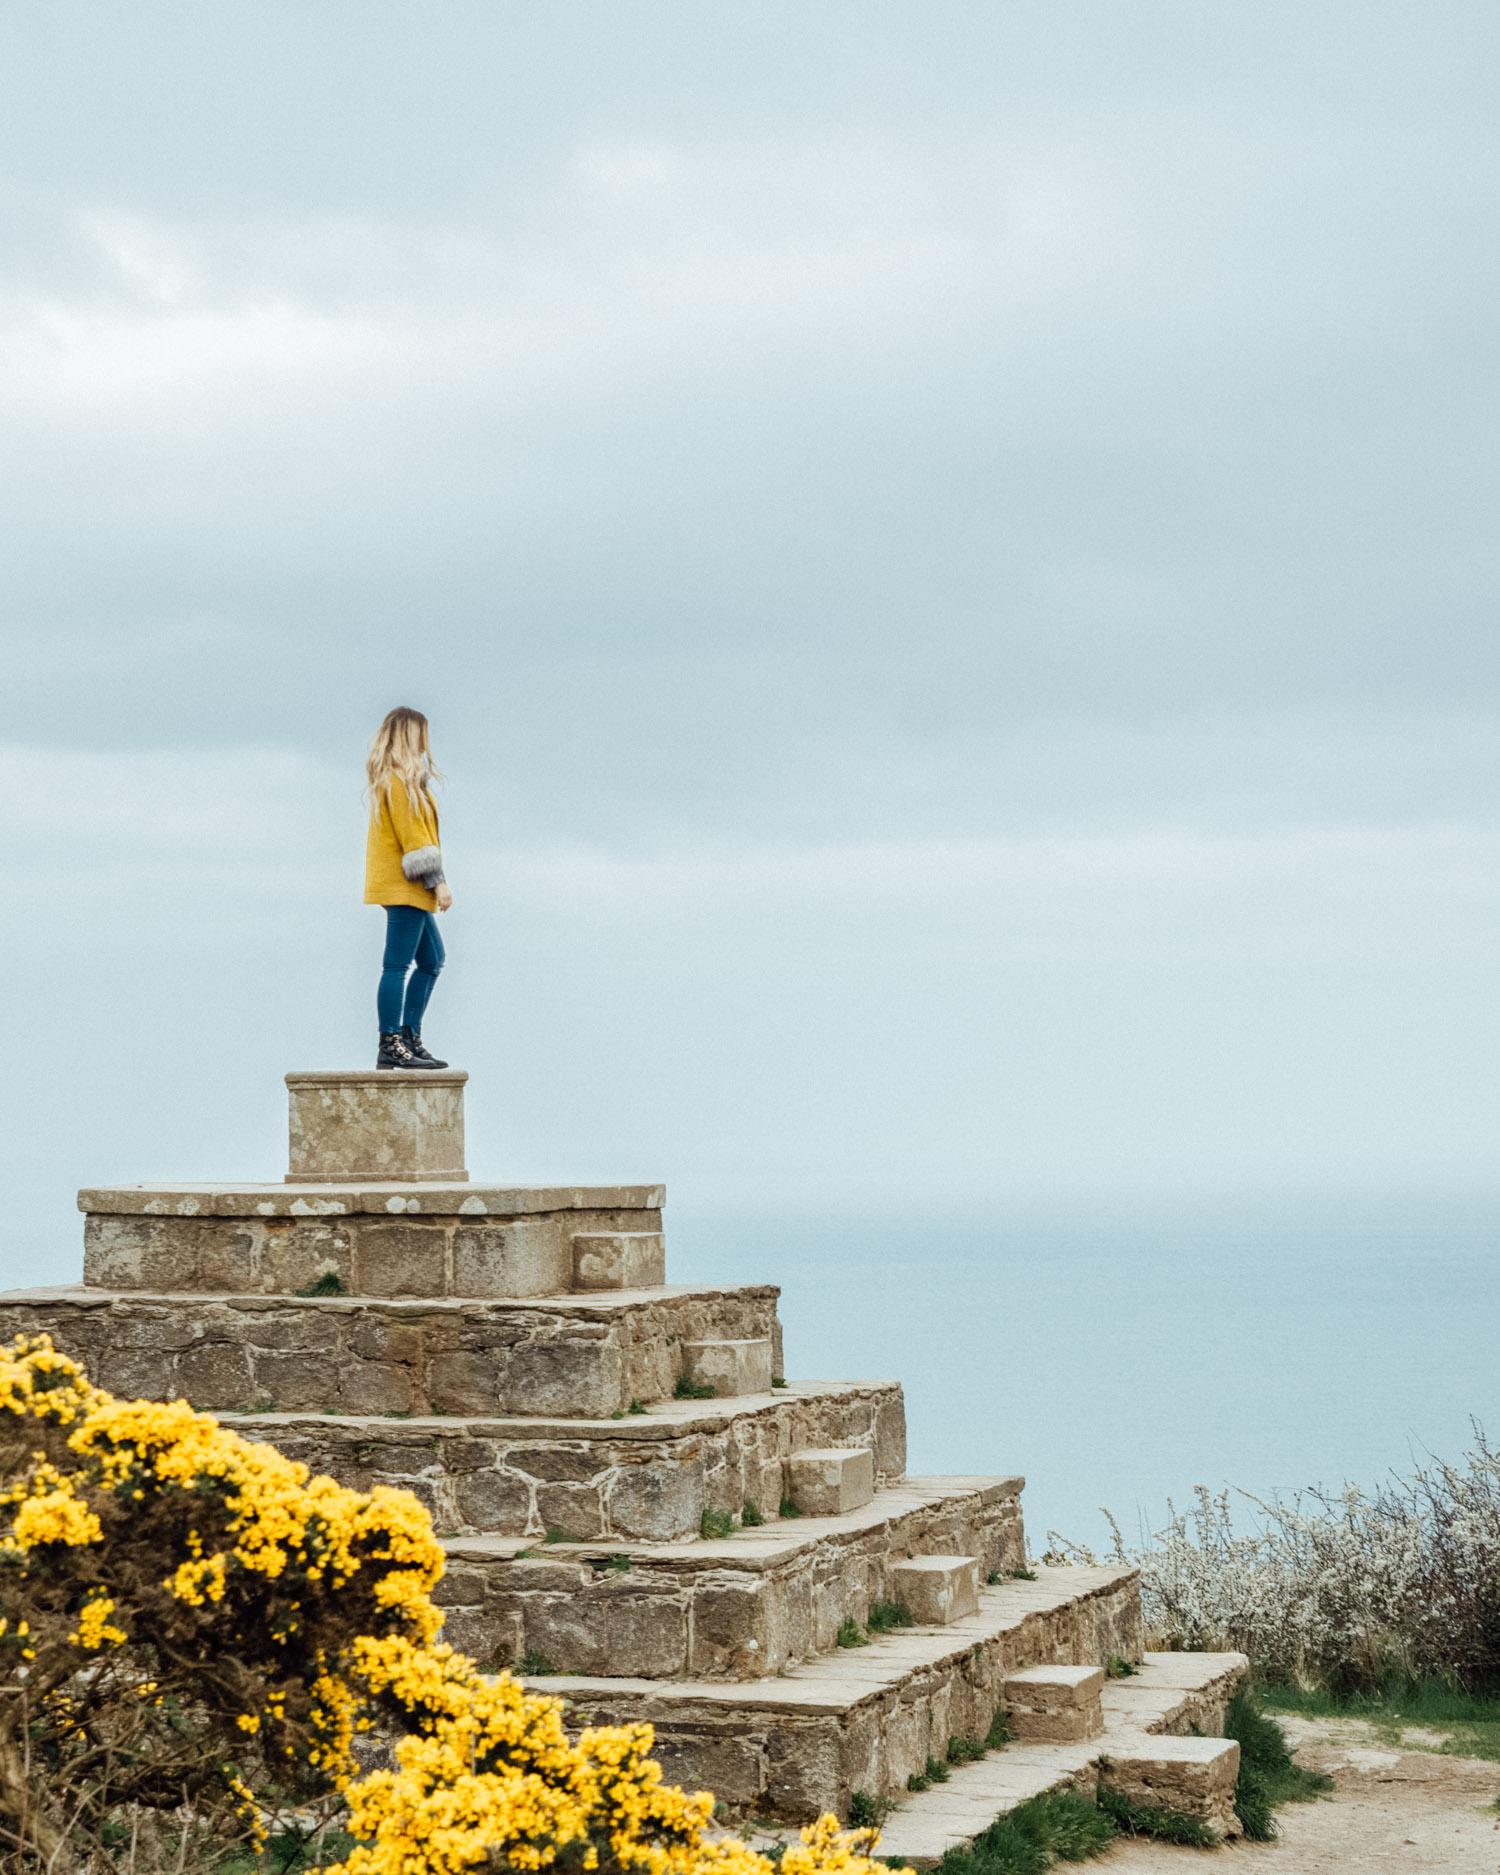 Adaras on Killiney Hill, Ireland - Dublin's Coastline